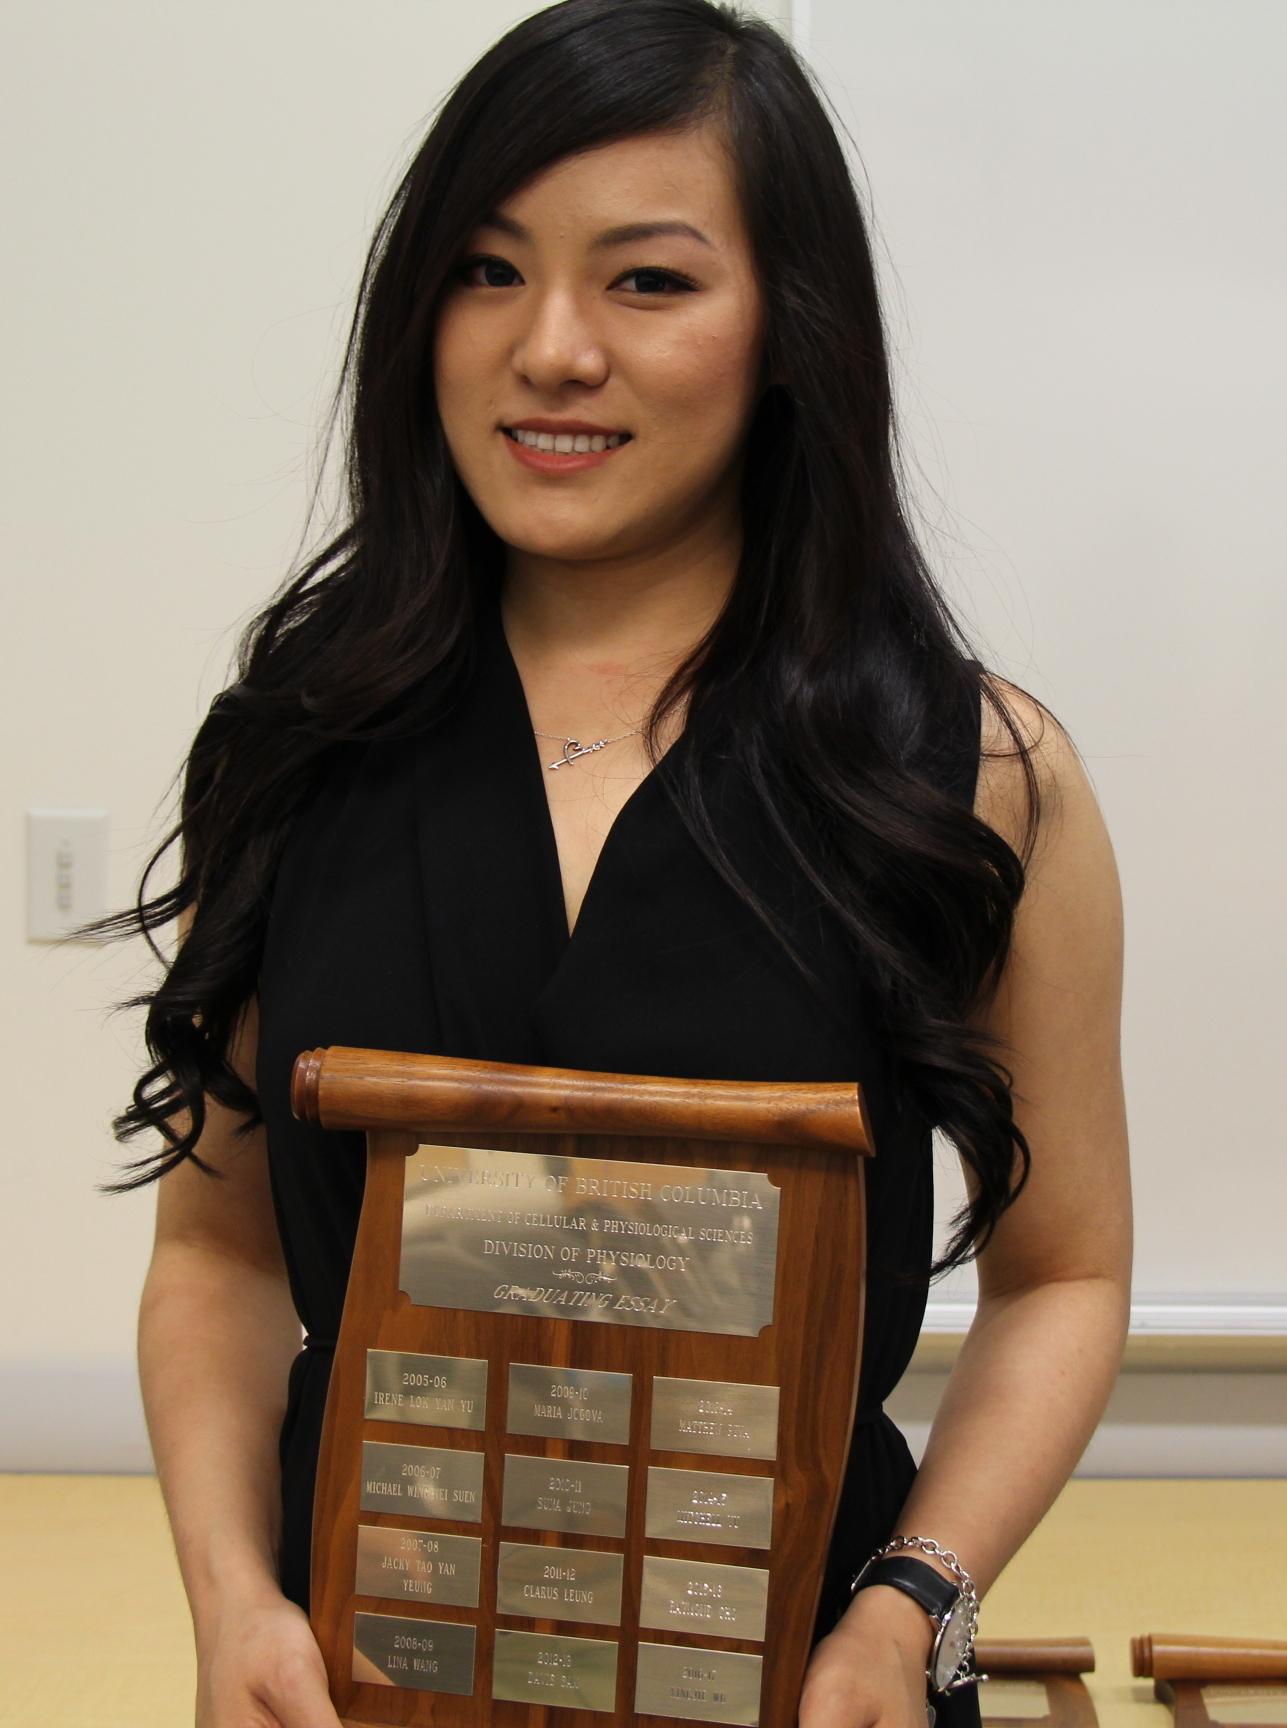 2017 CPS Graduate Award - 3